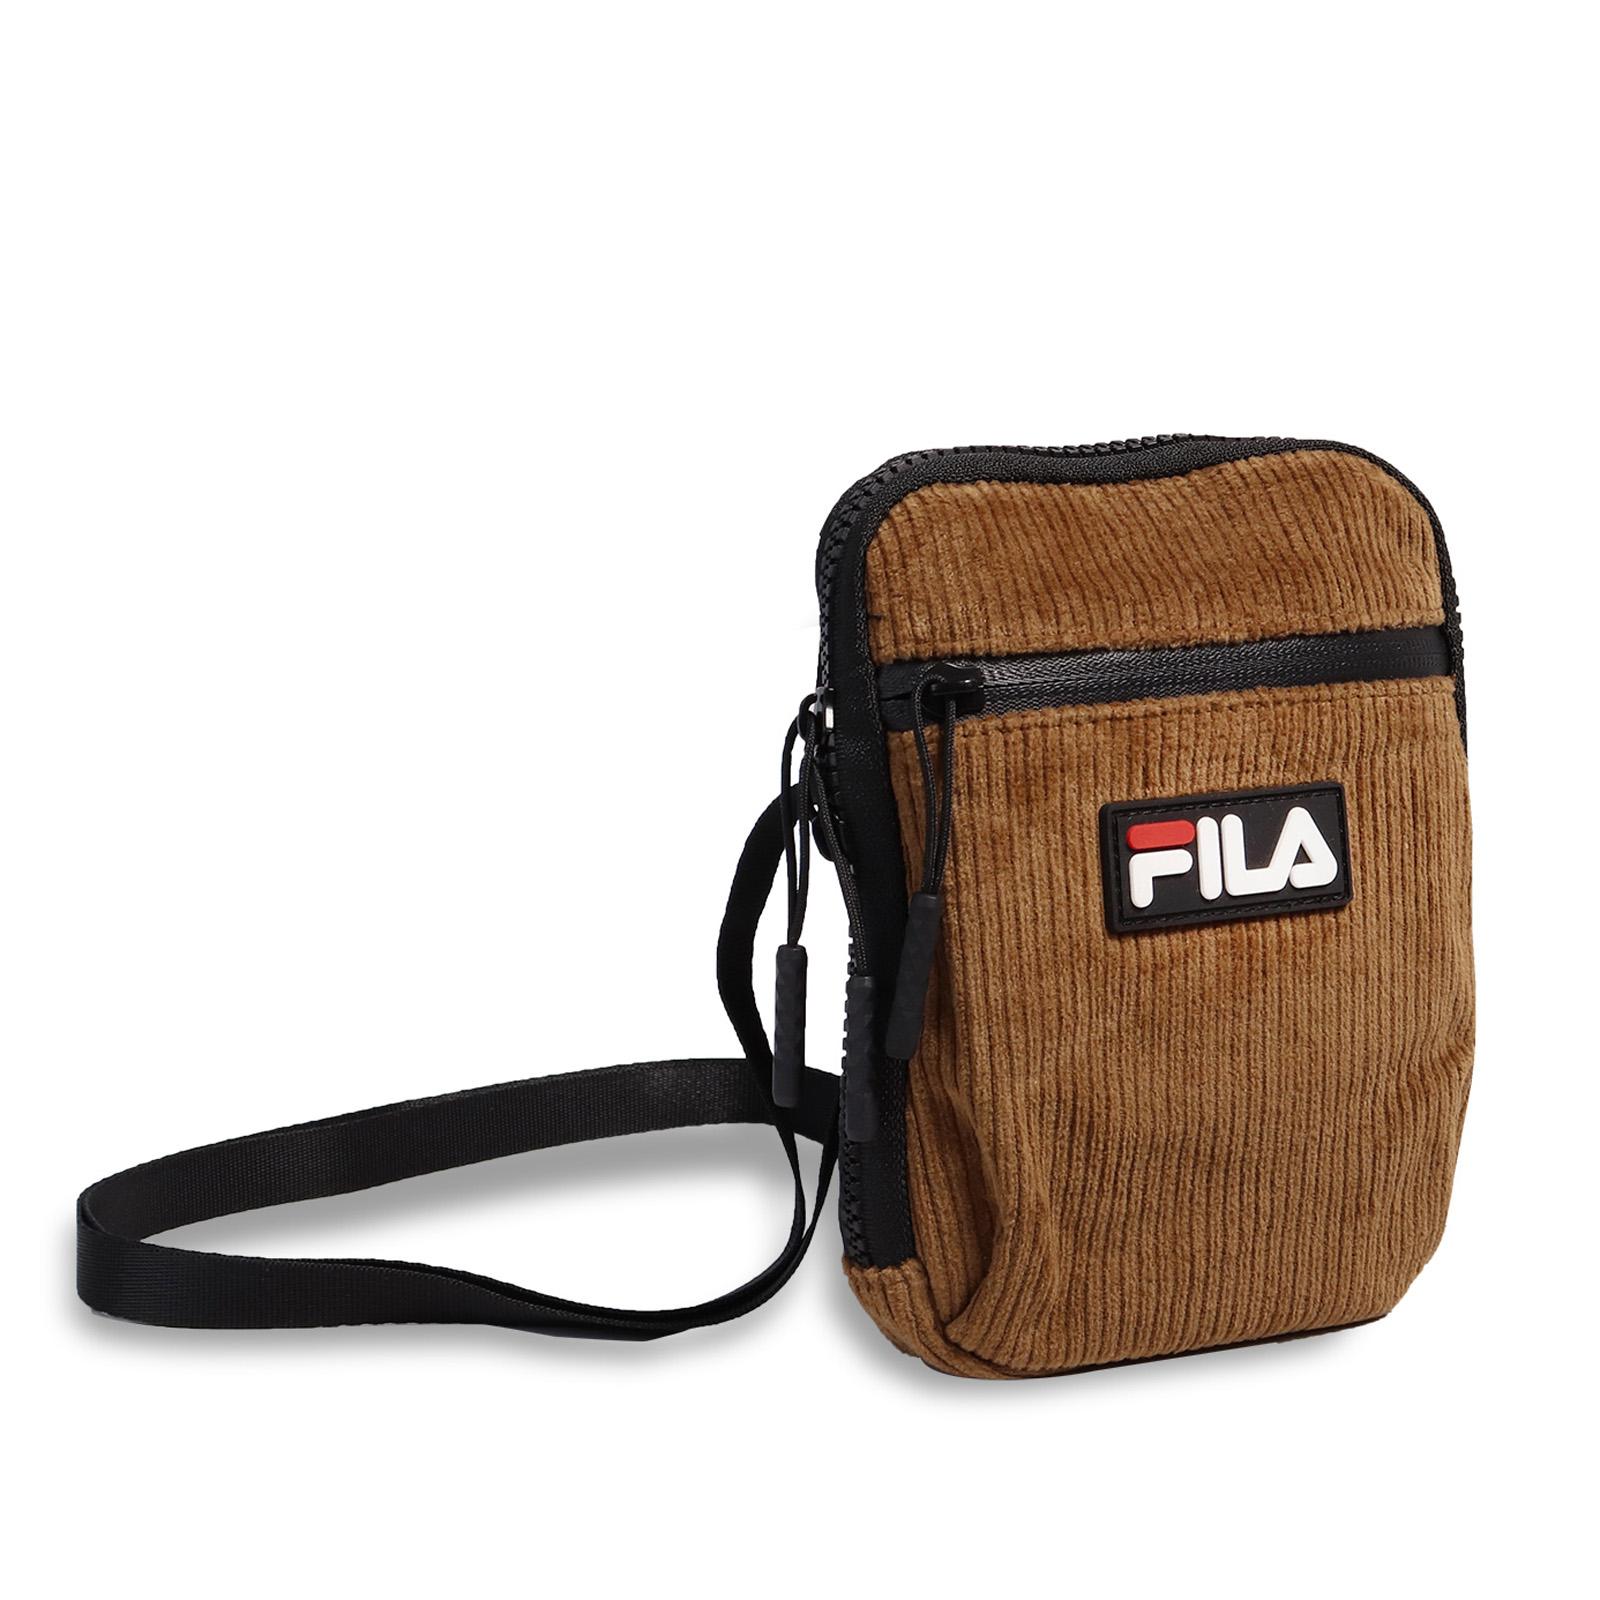 Fila 斜背包 Corduroy Shoulder Bag 咖啡 黑 男女款 燈心絨 小包【ACS】BSU9006OR